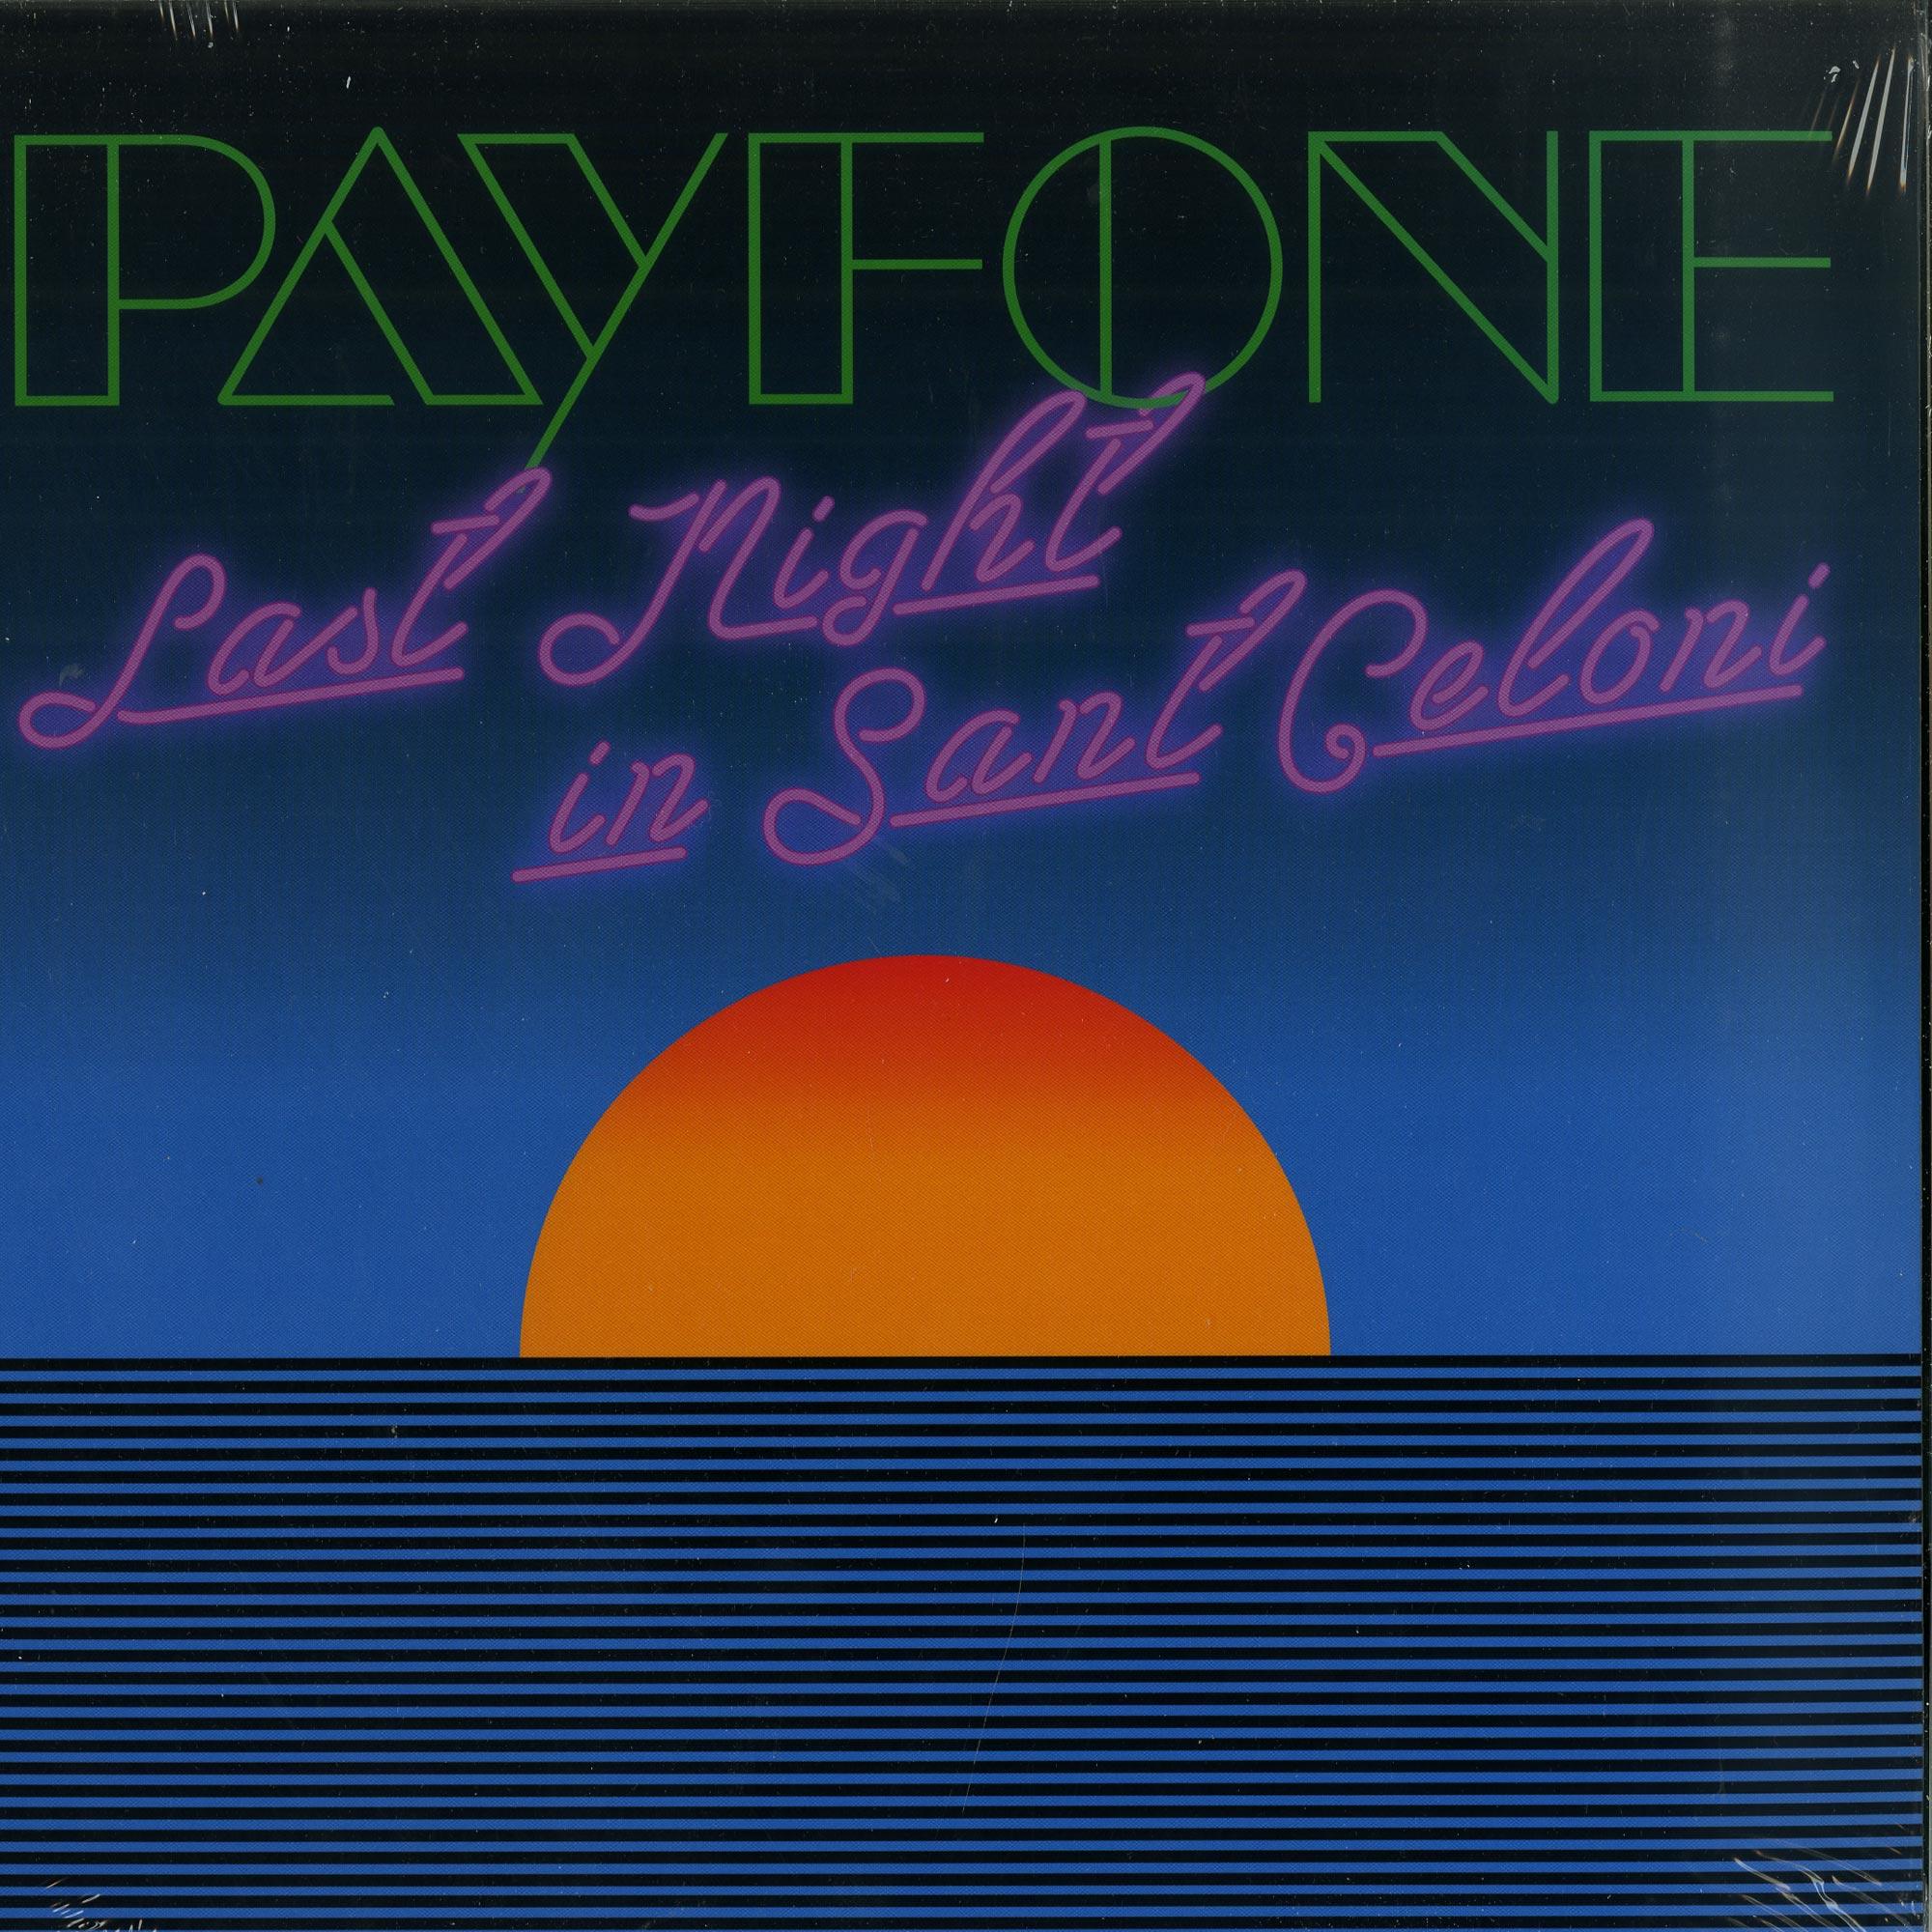 Payfone - LAST NIGHT IN SANT CELONI